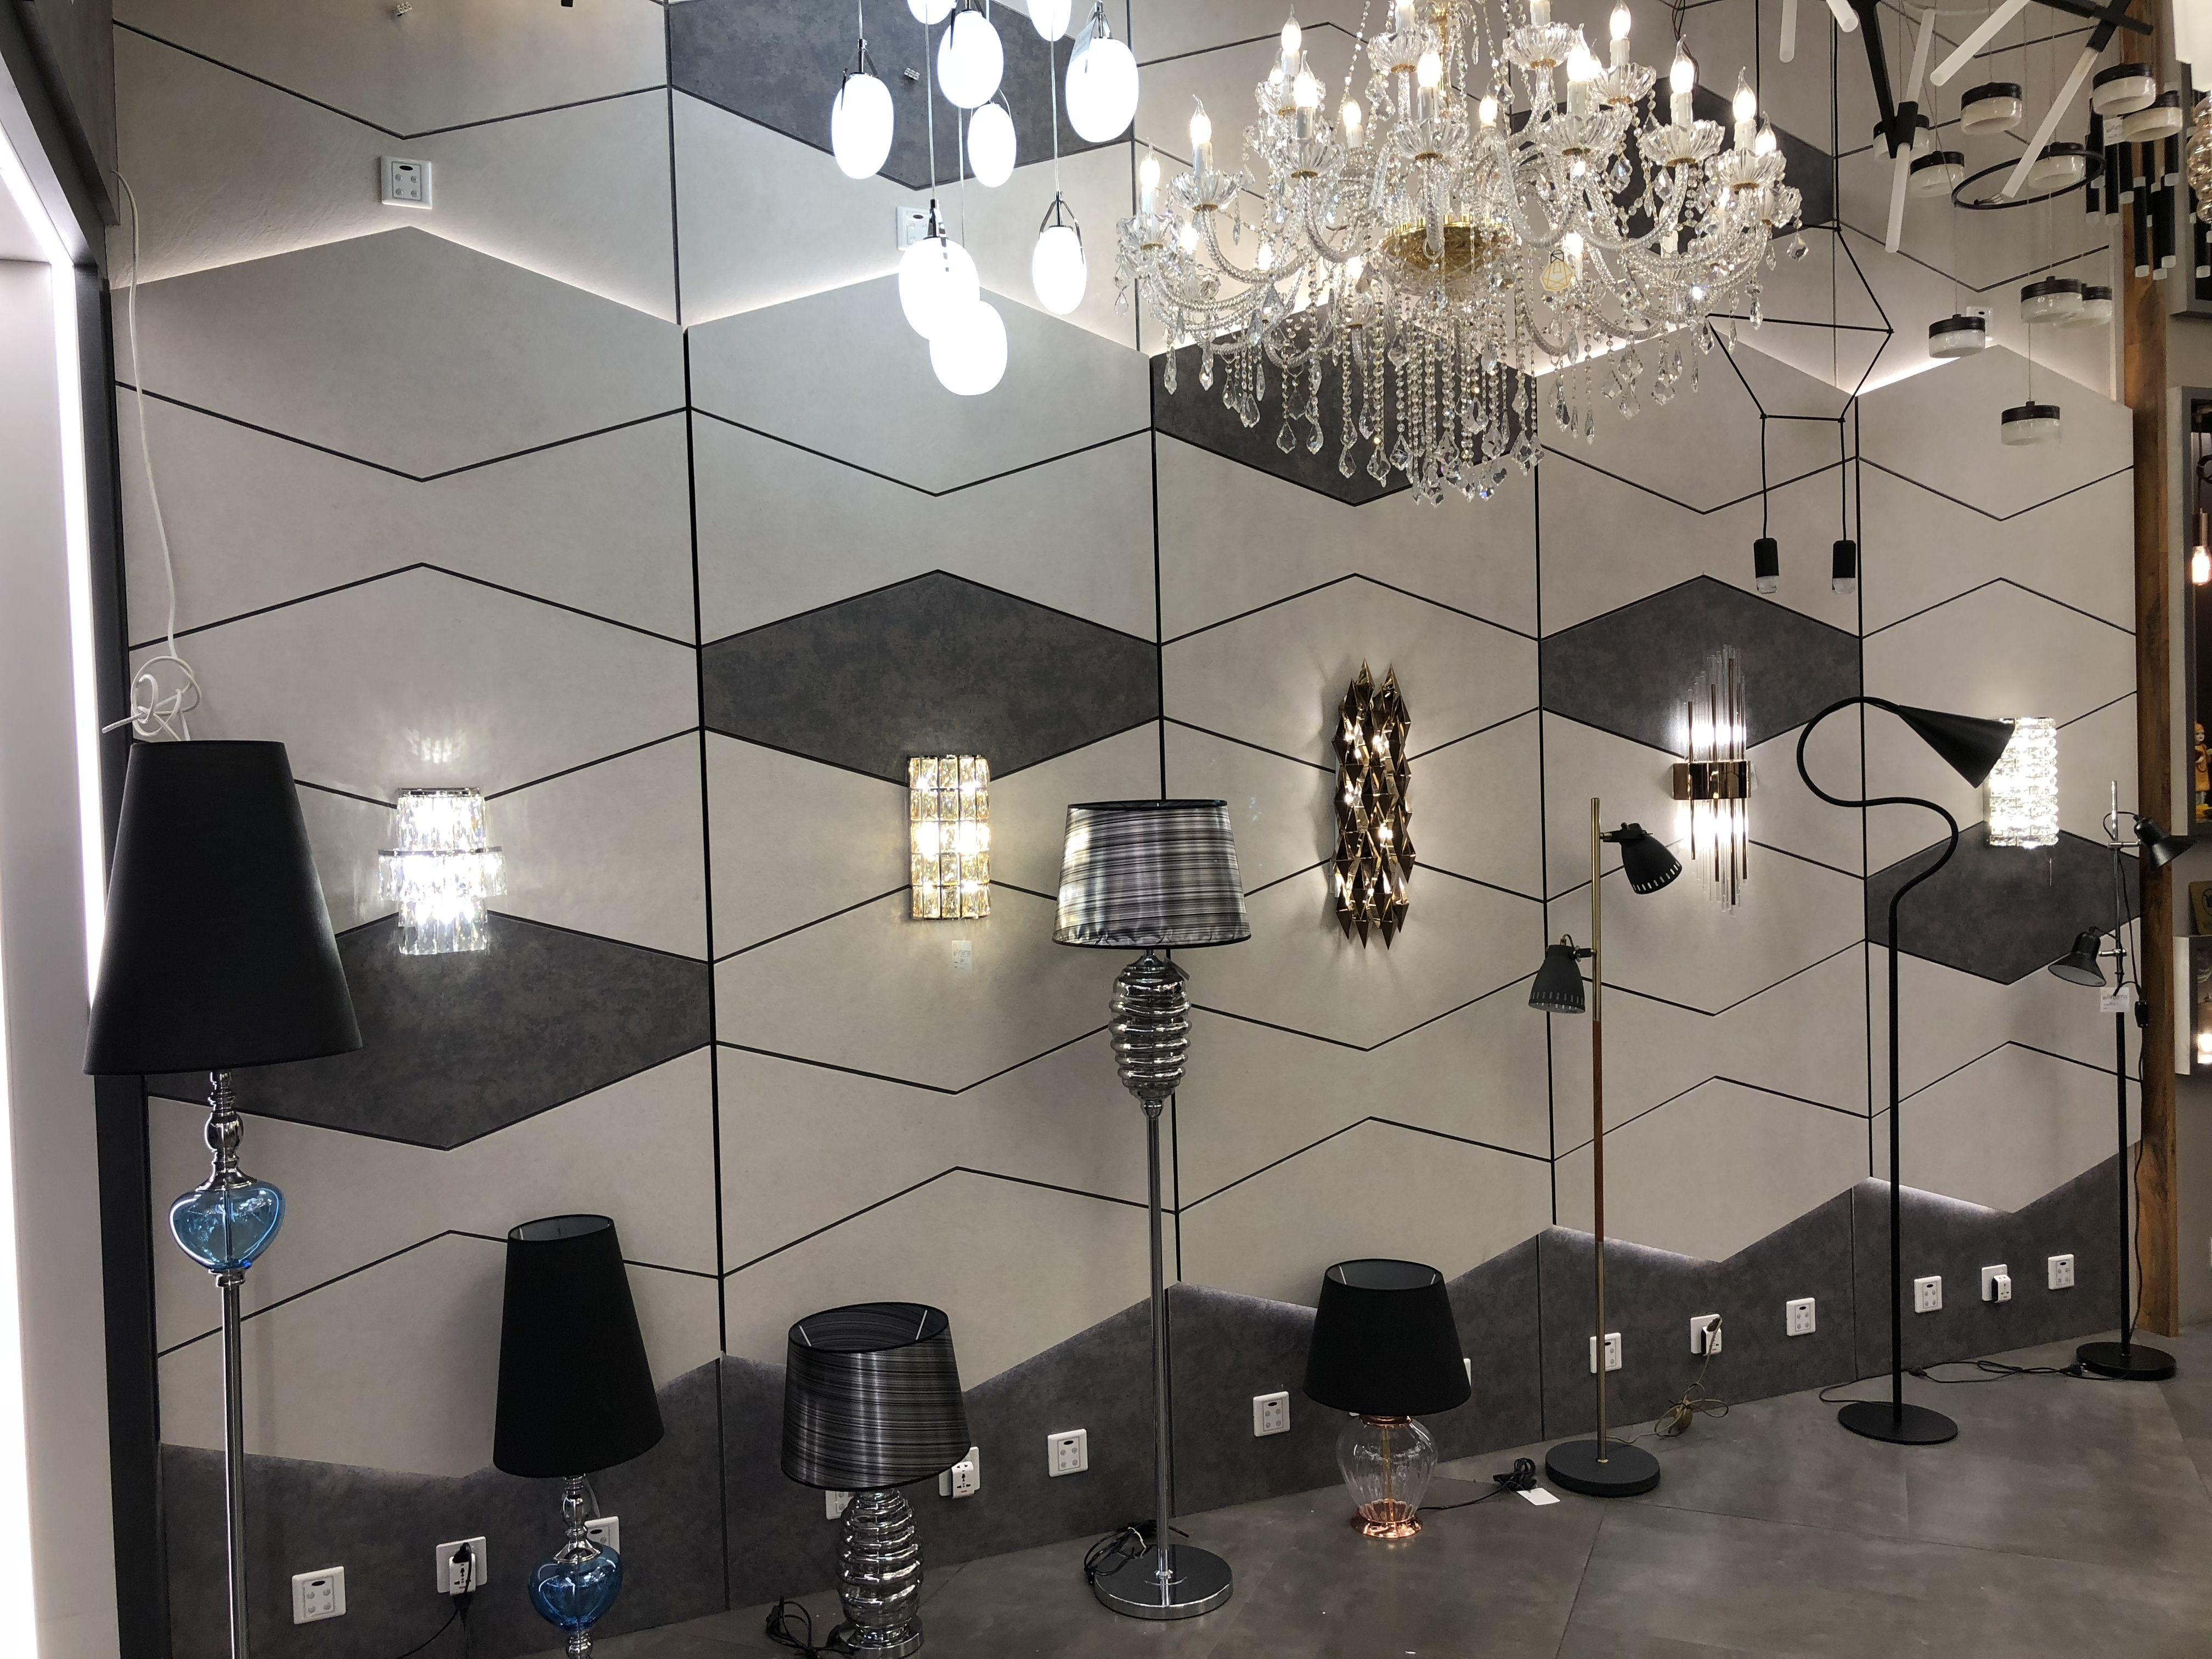 Lightdisplay Pattern Wallpanel Walllights Showroom Contemporary Stonelook Laminatefinish Lighting Showroom Wall Paneling Light Display